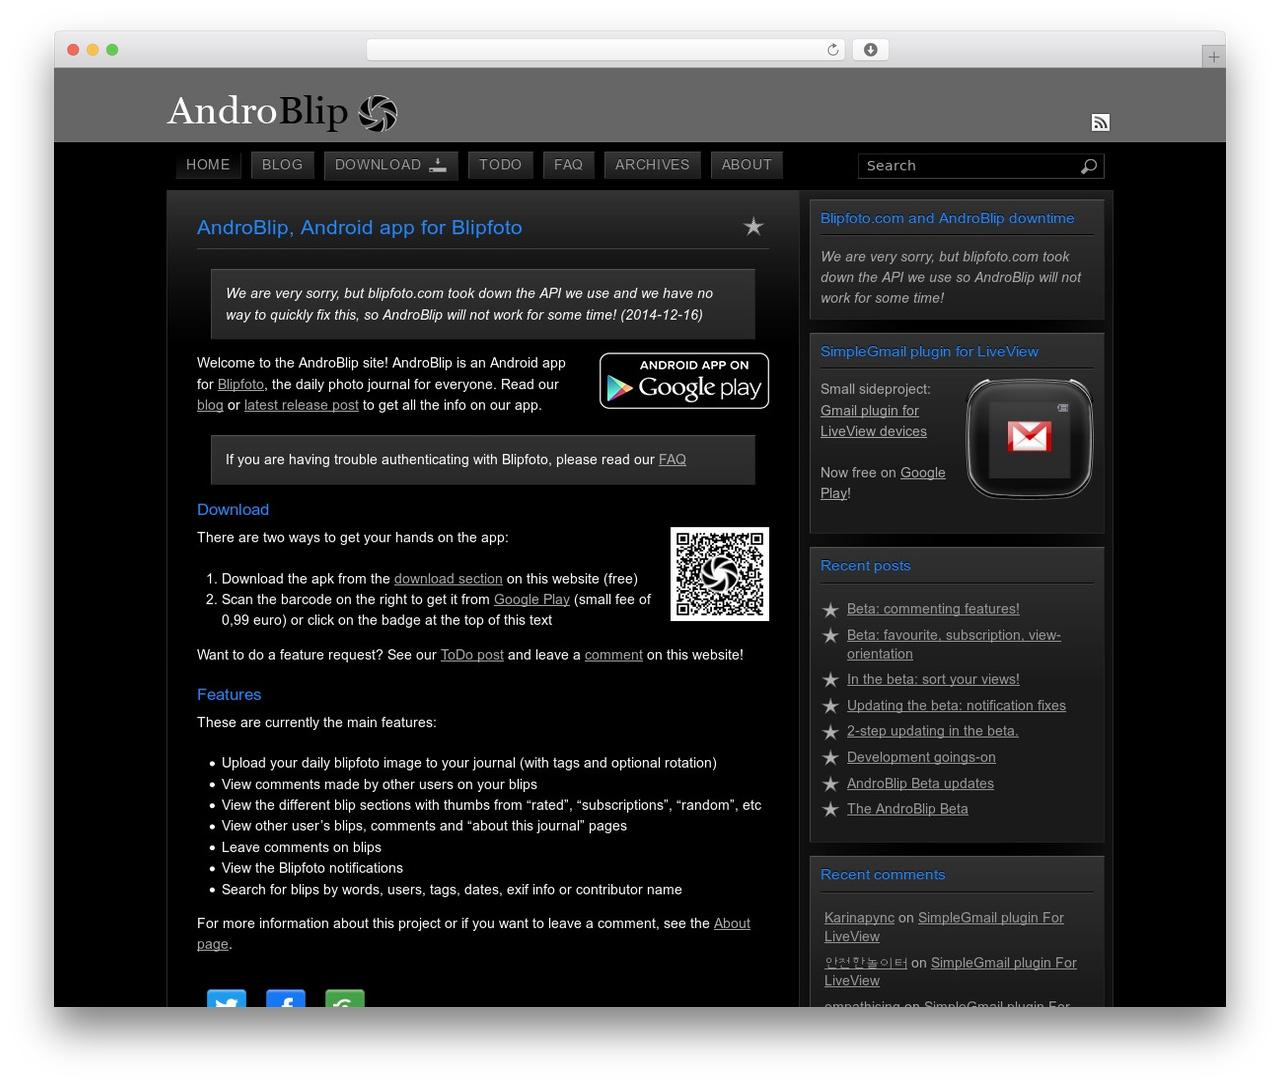 Apk Website Theme